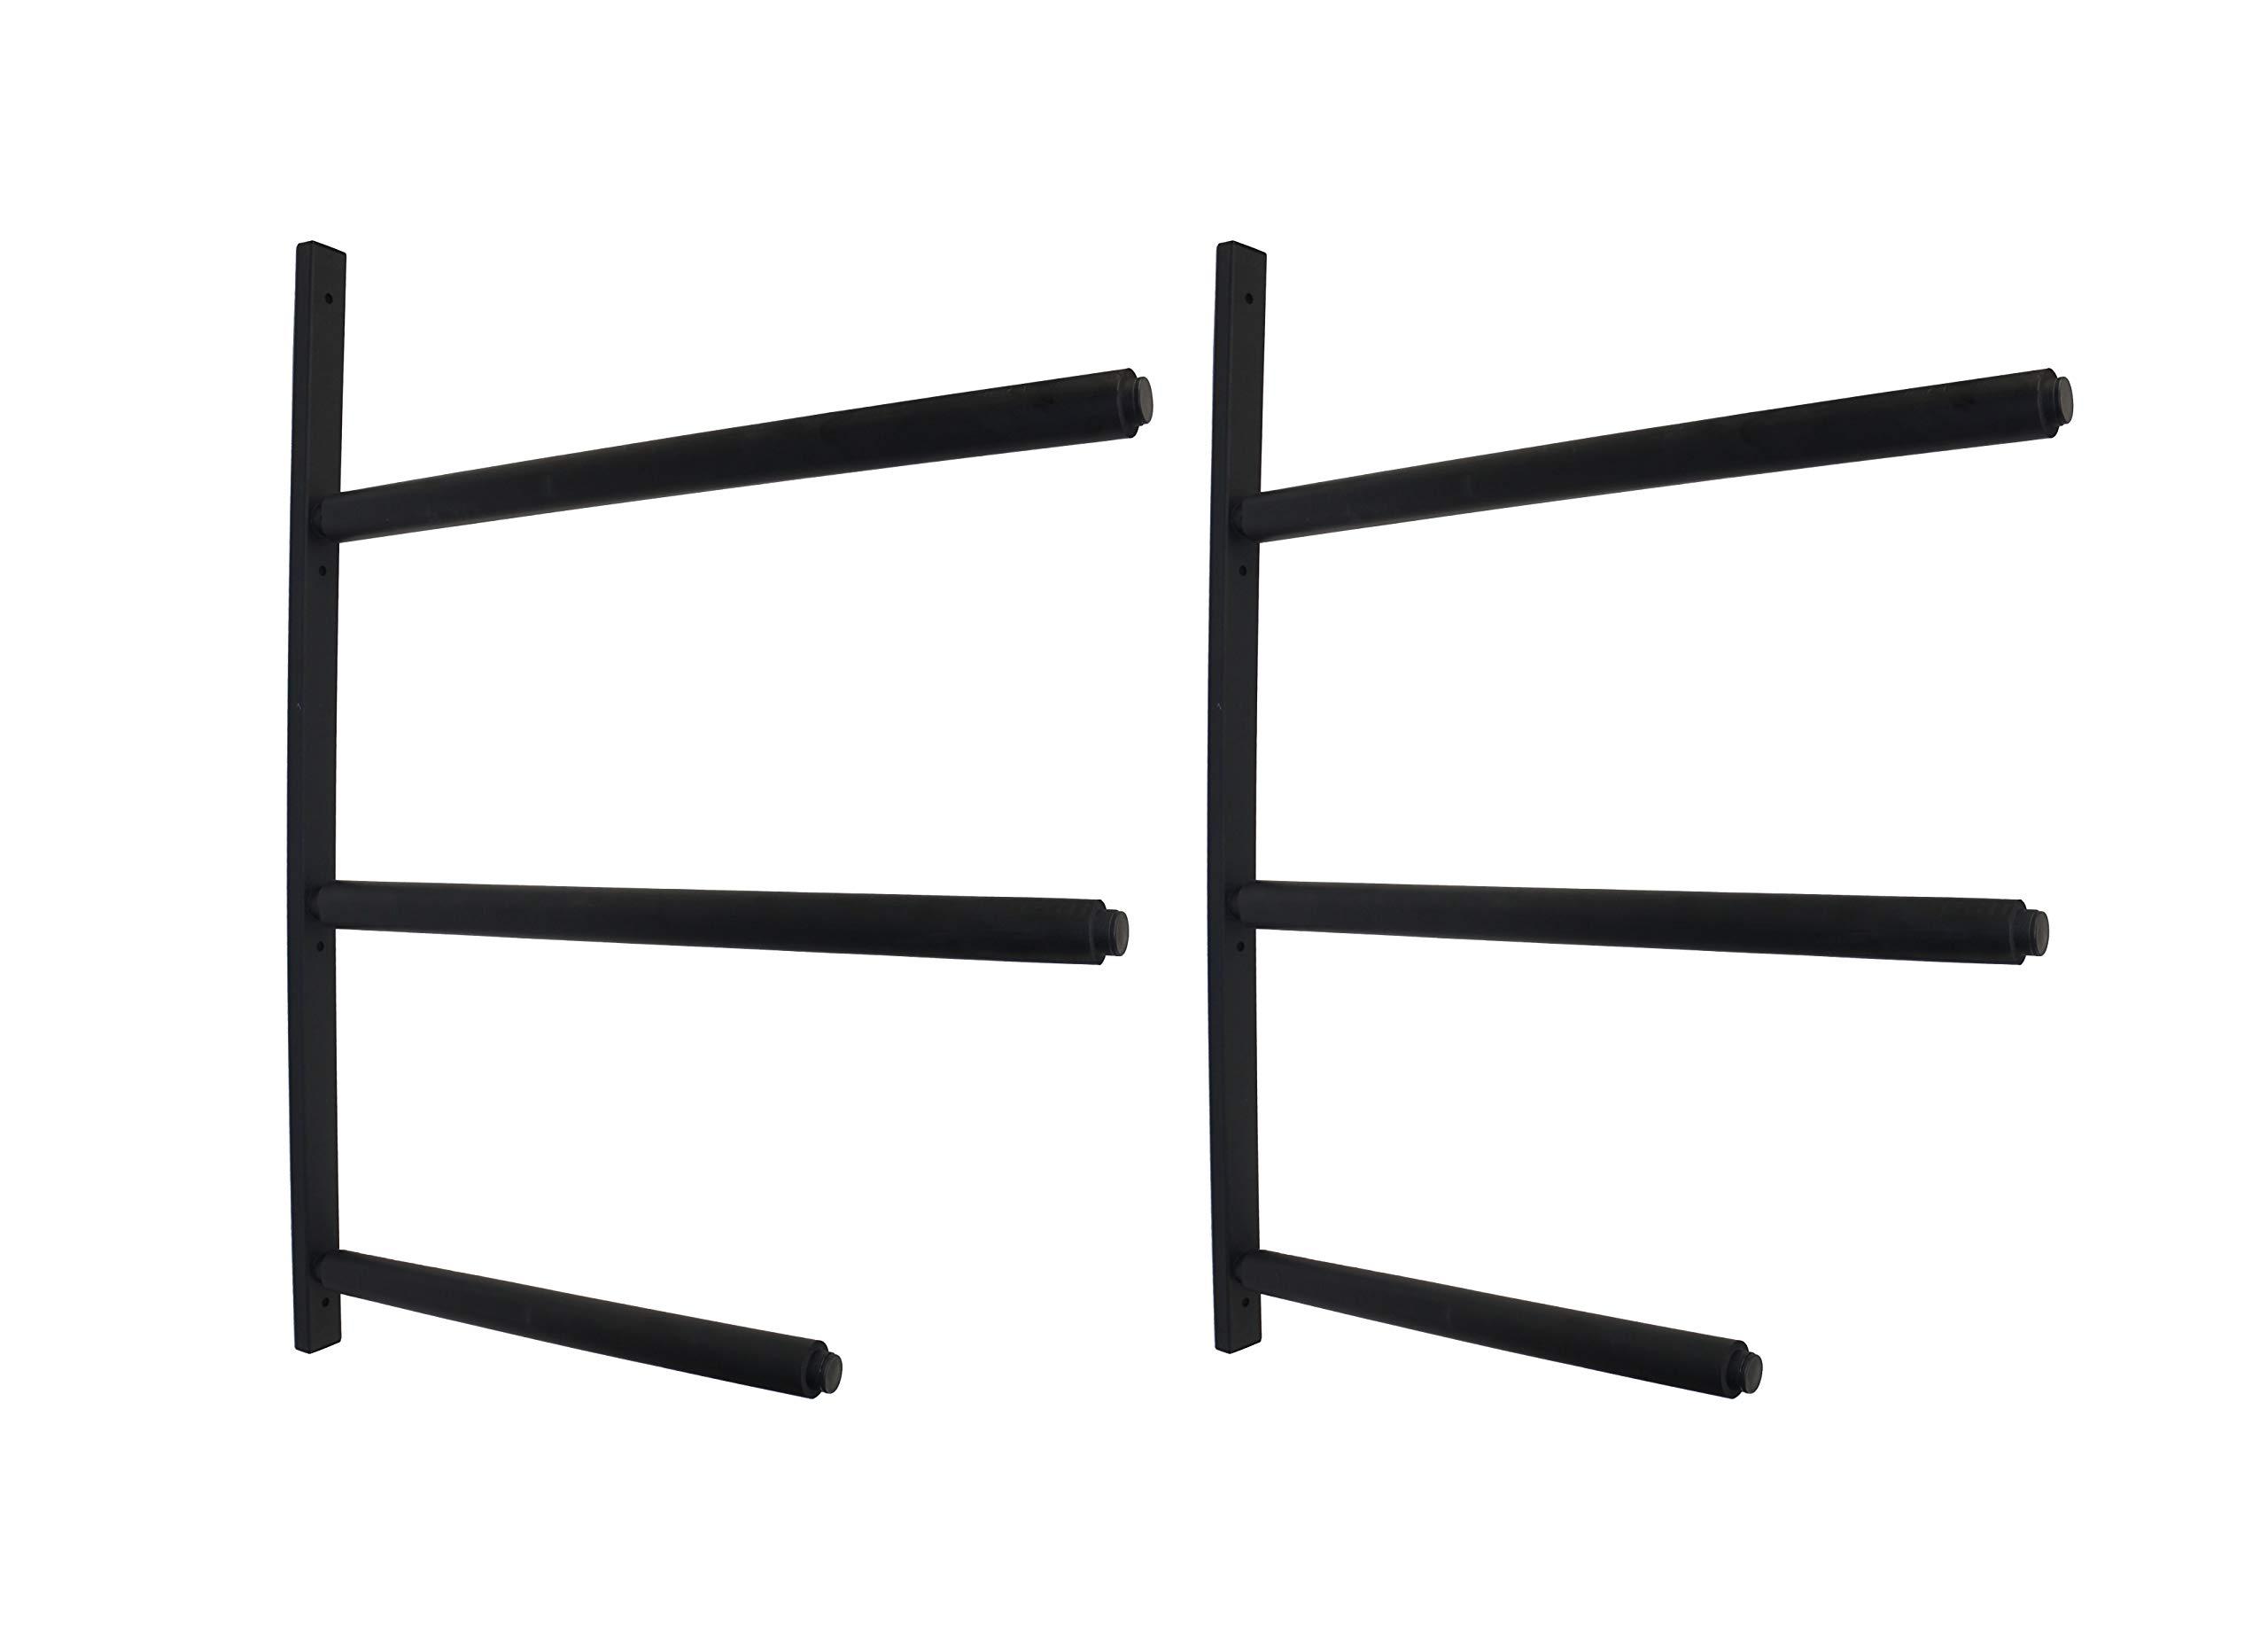 Mrhardware SUP Snowboard Surfboard Paddle Board Ski Wall Mount Storage Display Rack Cradle (Black, 3 Boards) by Mrhardware